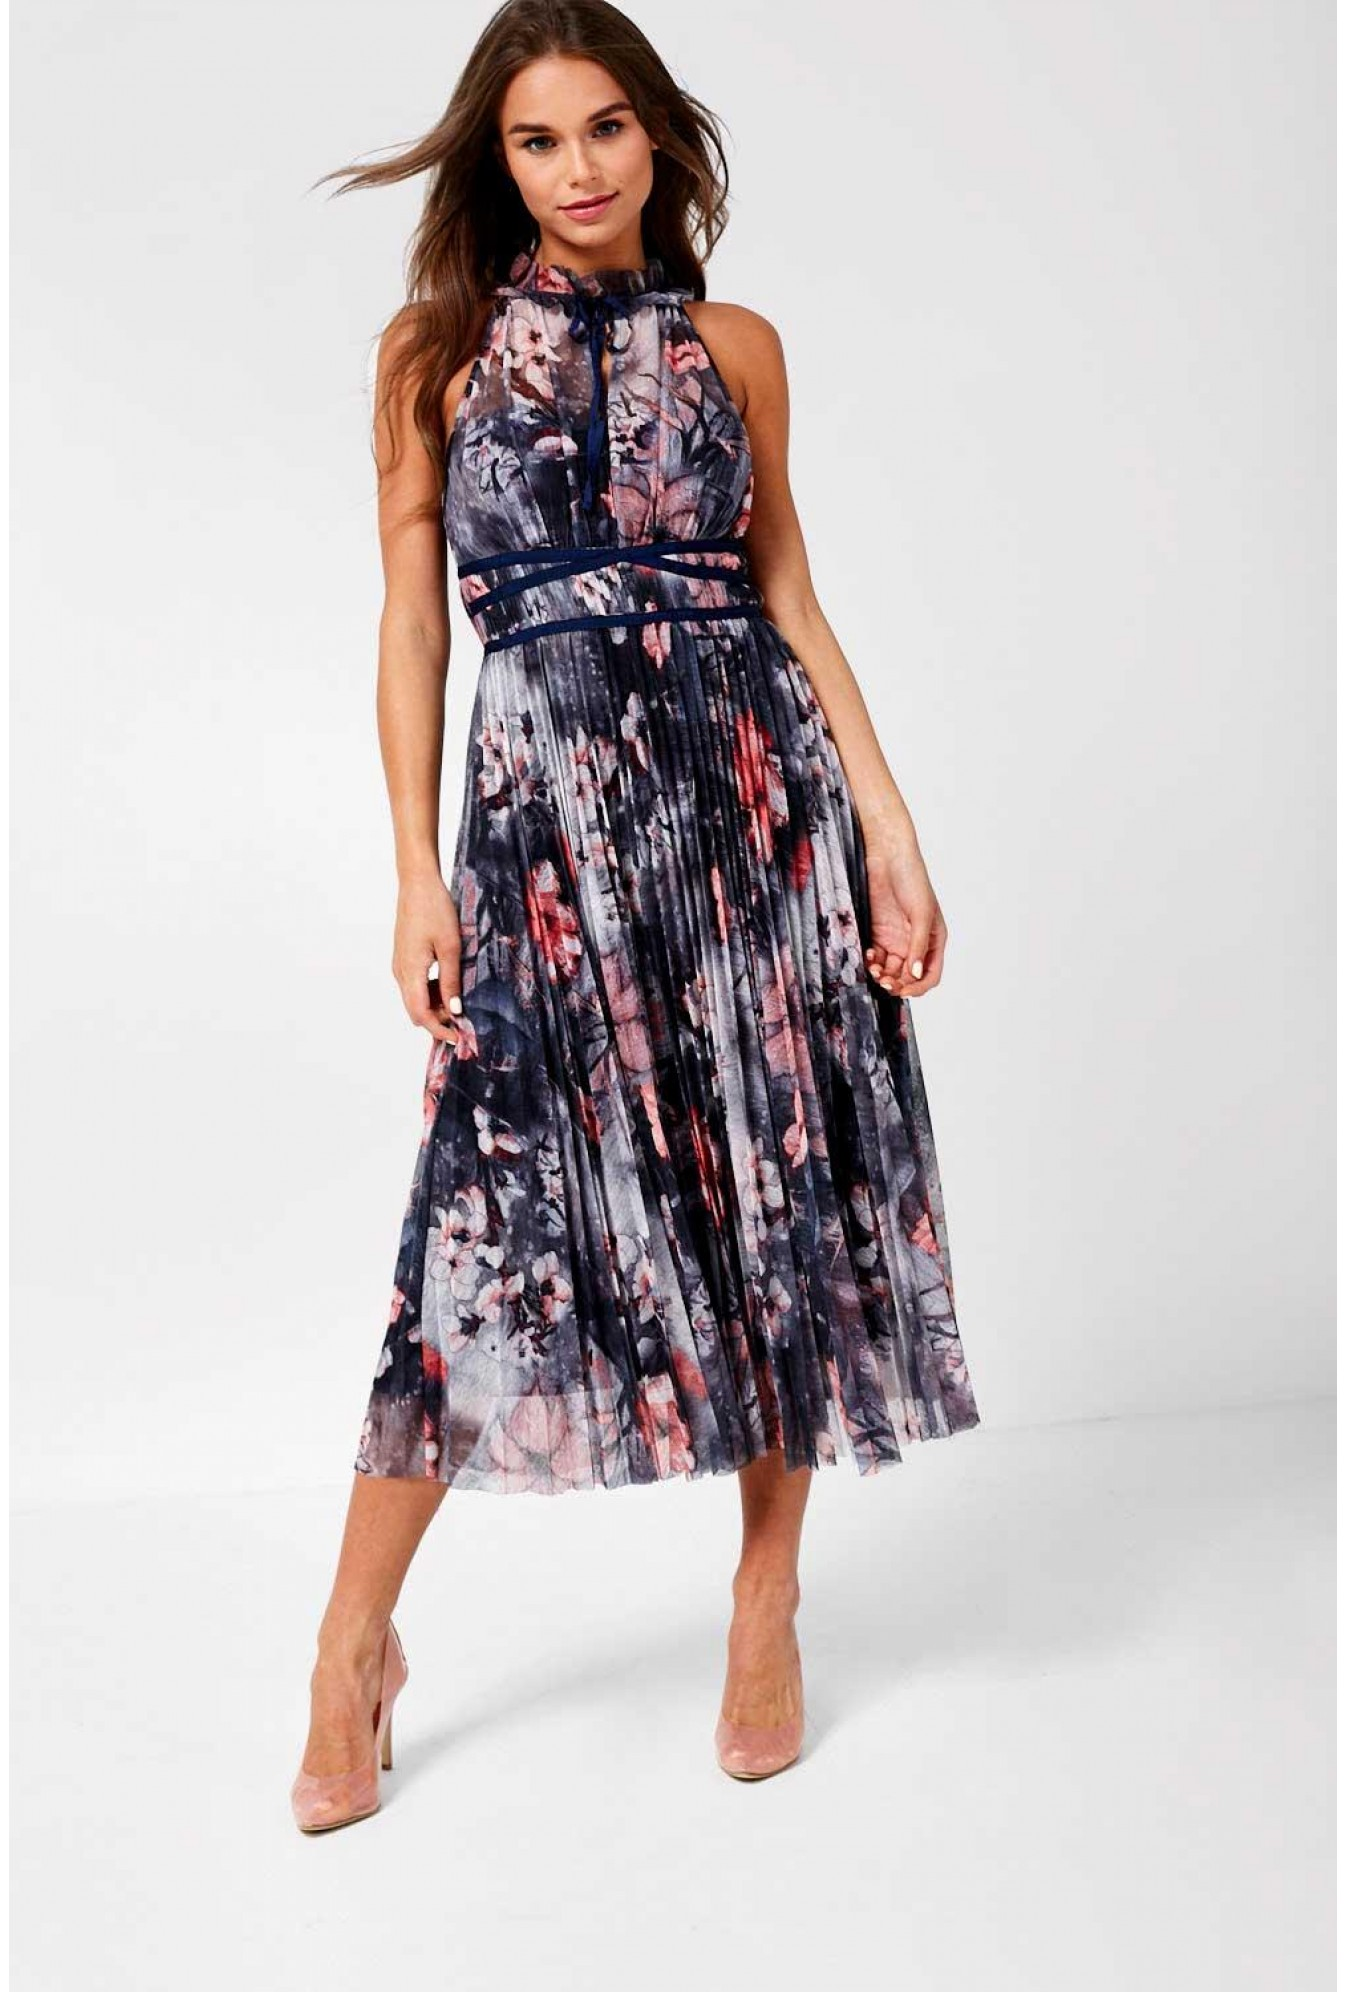 849b754065096 Stella Hannah Occasion Midi Dress in Grey Floral Print | iCLOTHING